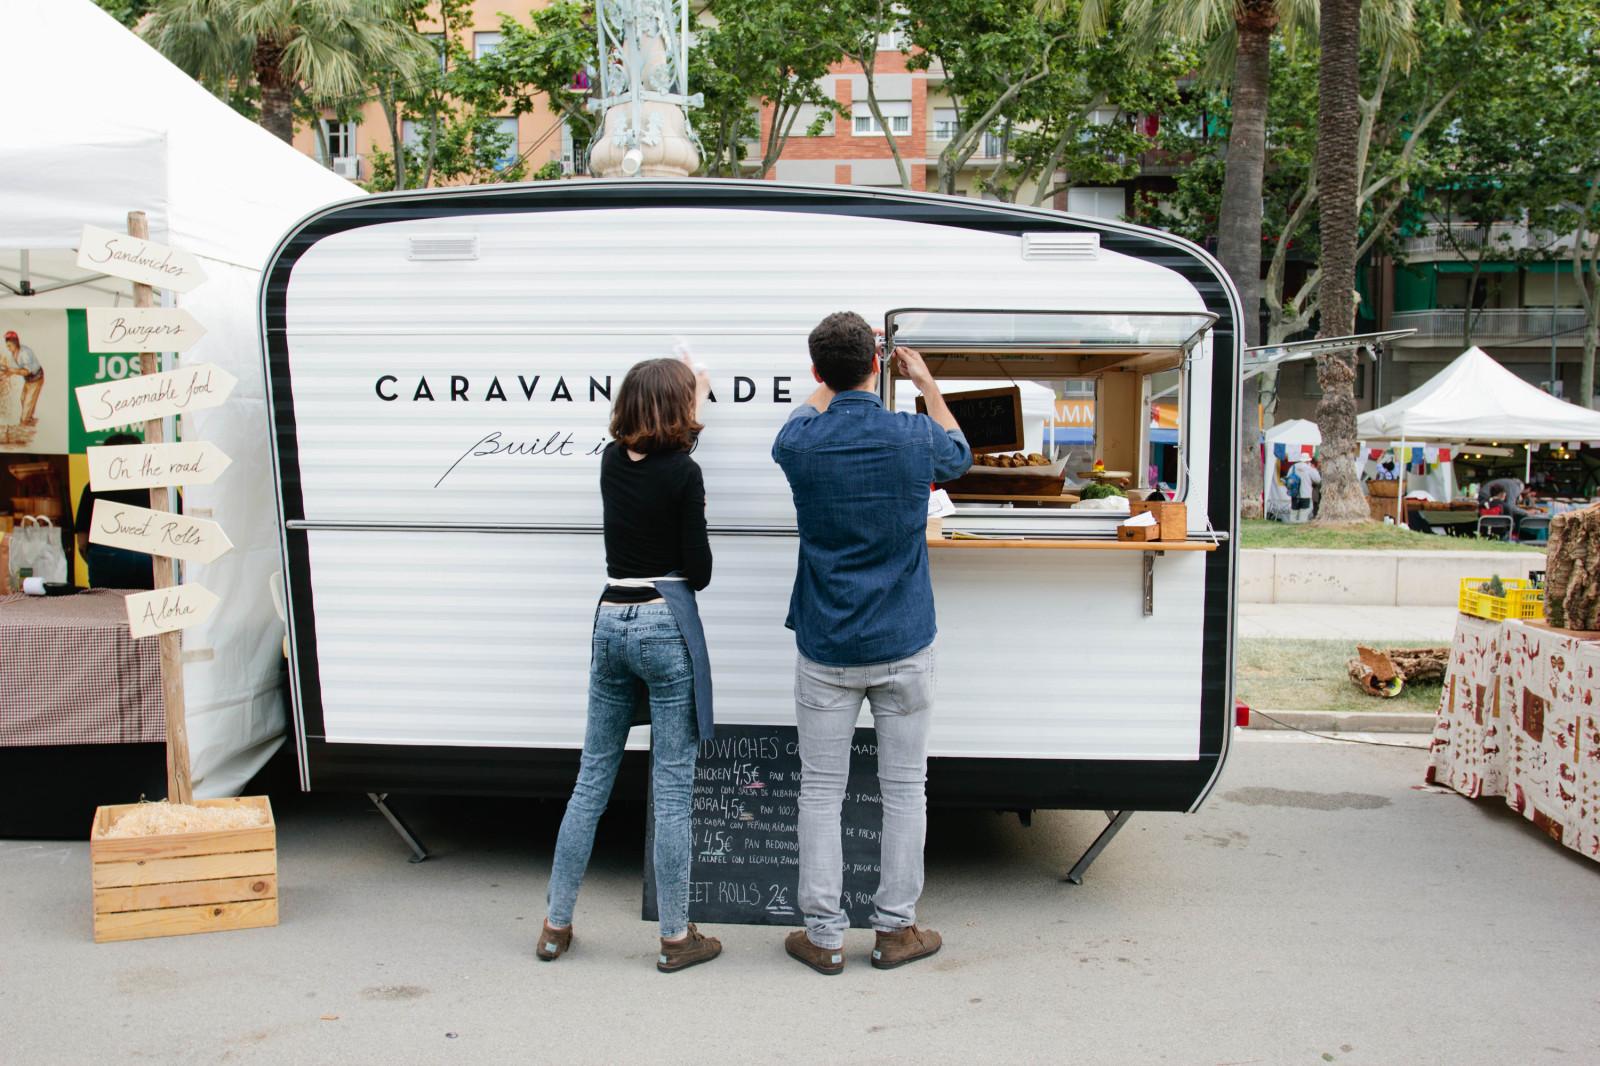 Caravan Made An Alfresco Food Truck In Barcelona